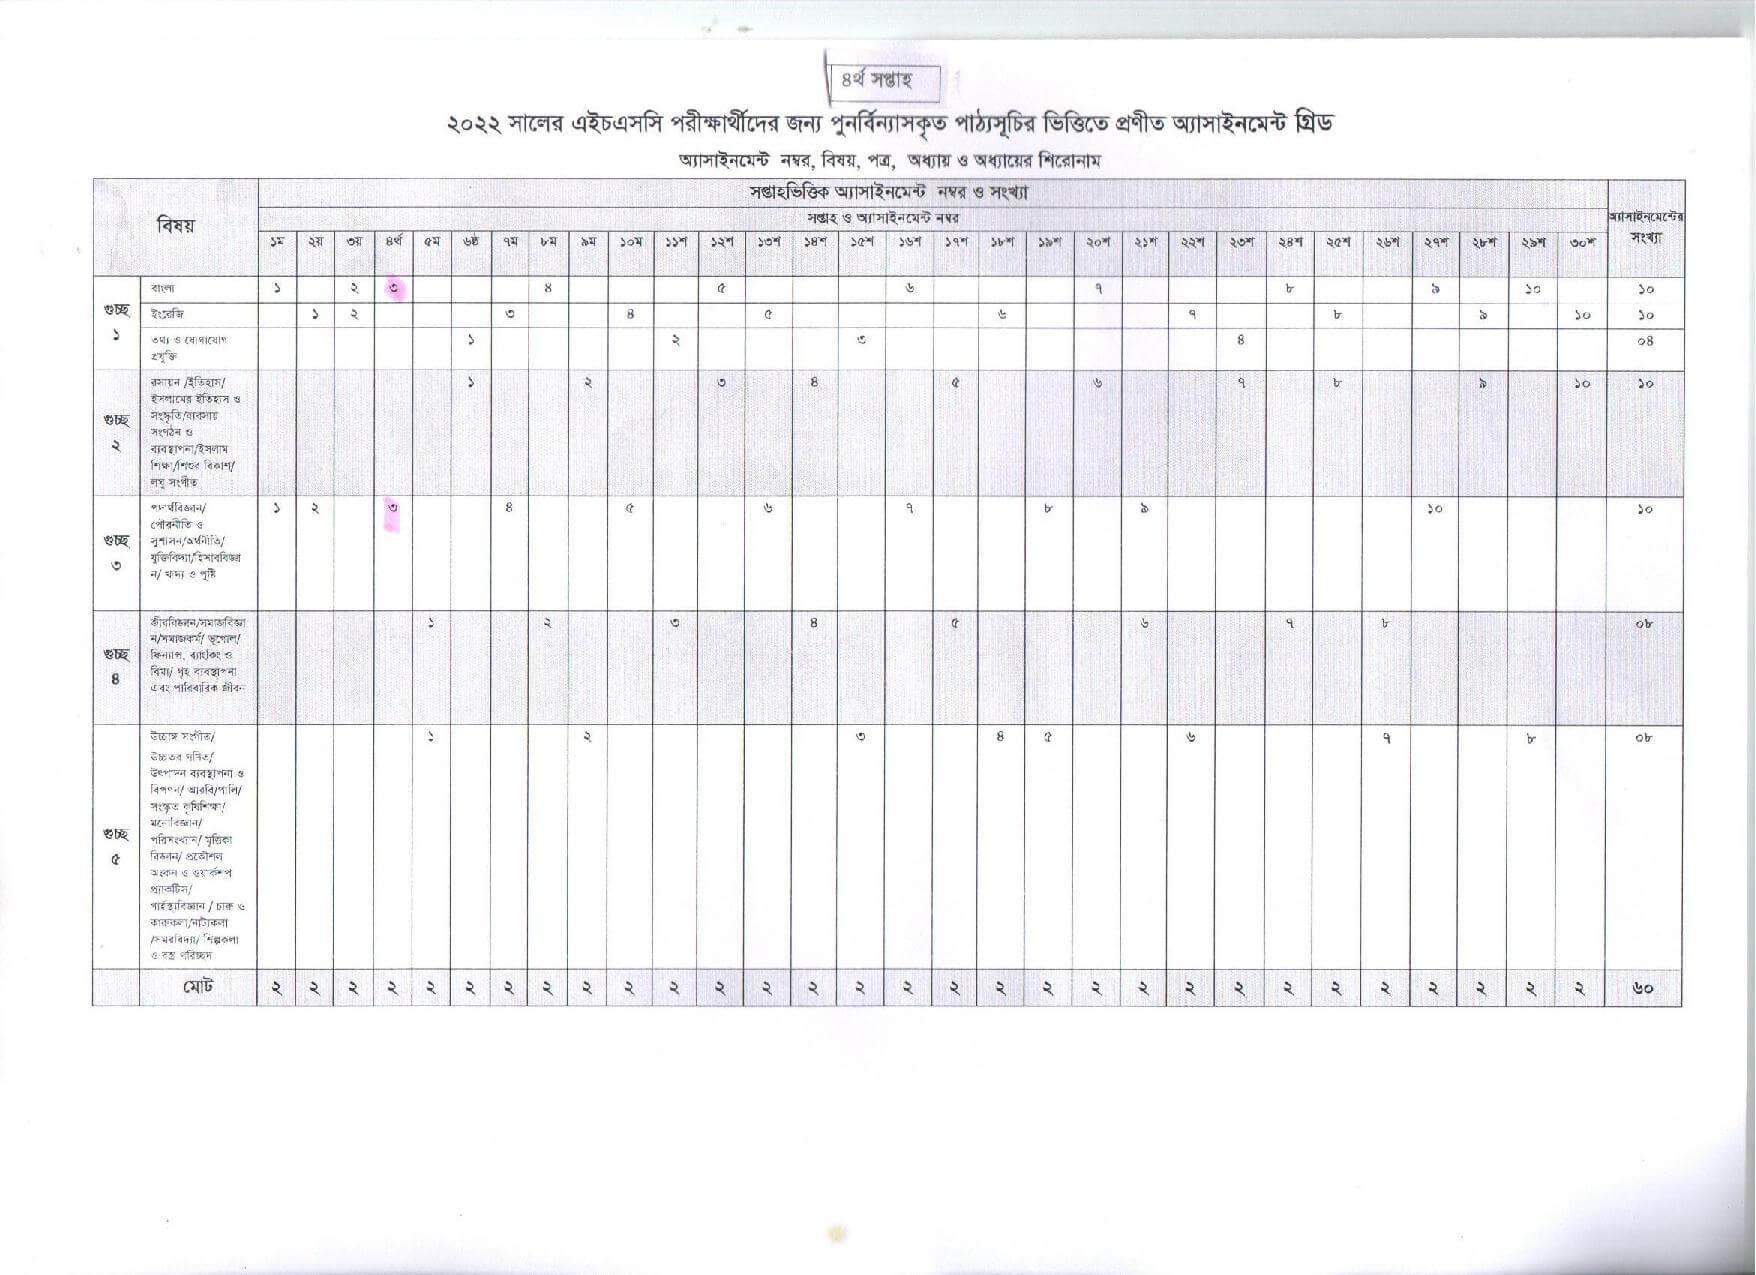 HSC Assignment 2022 PDF